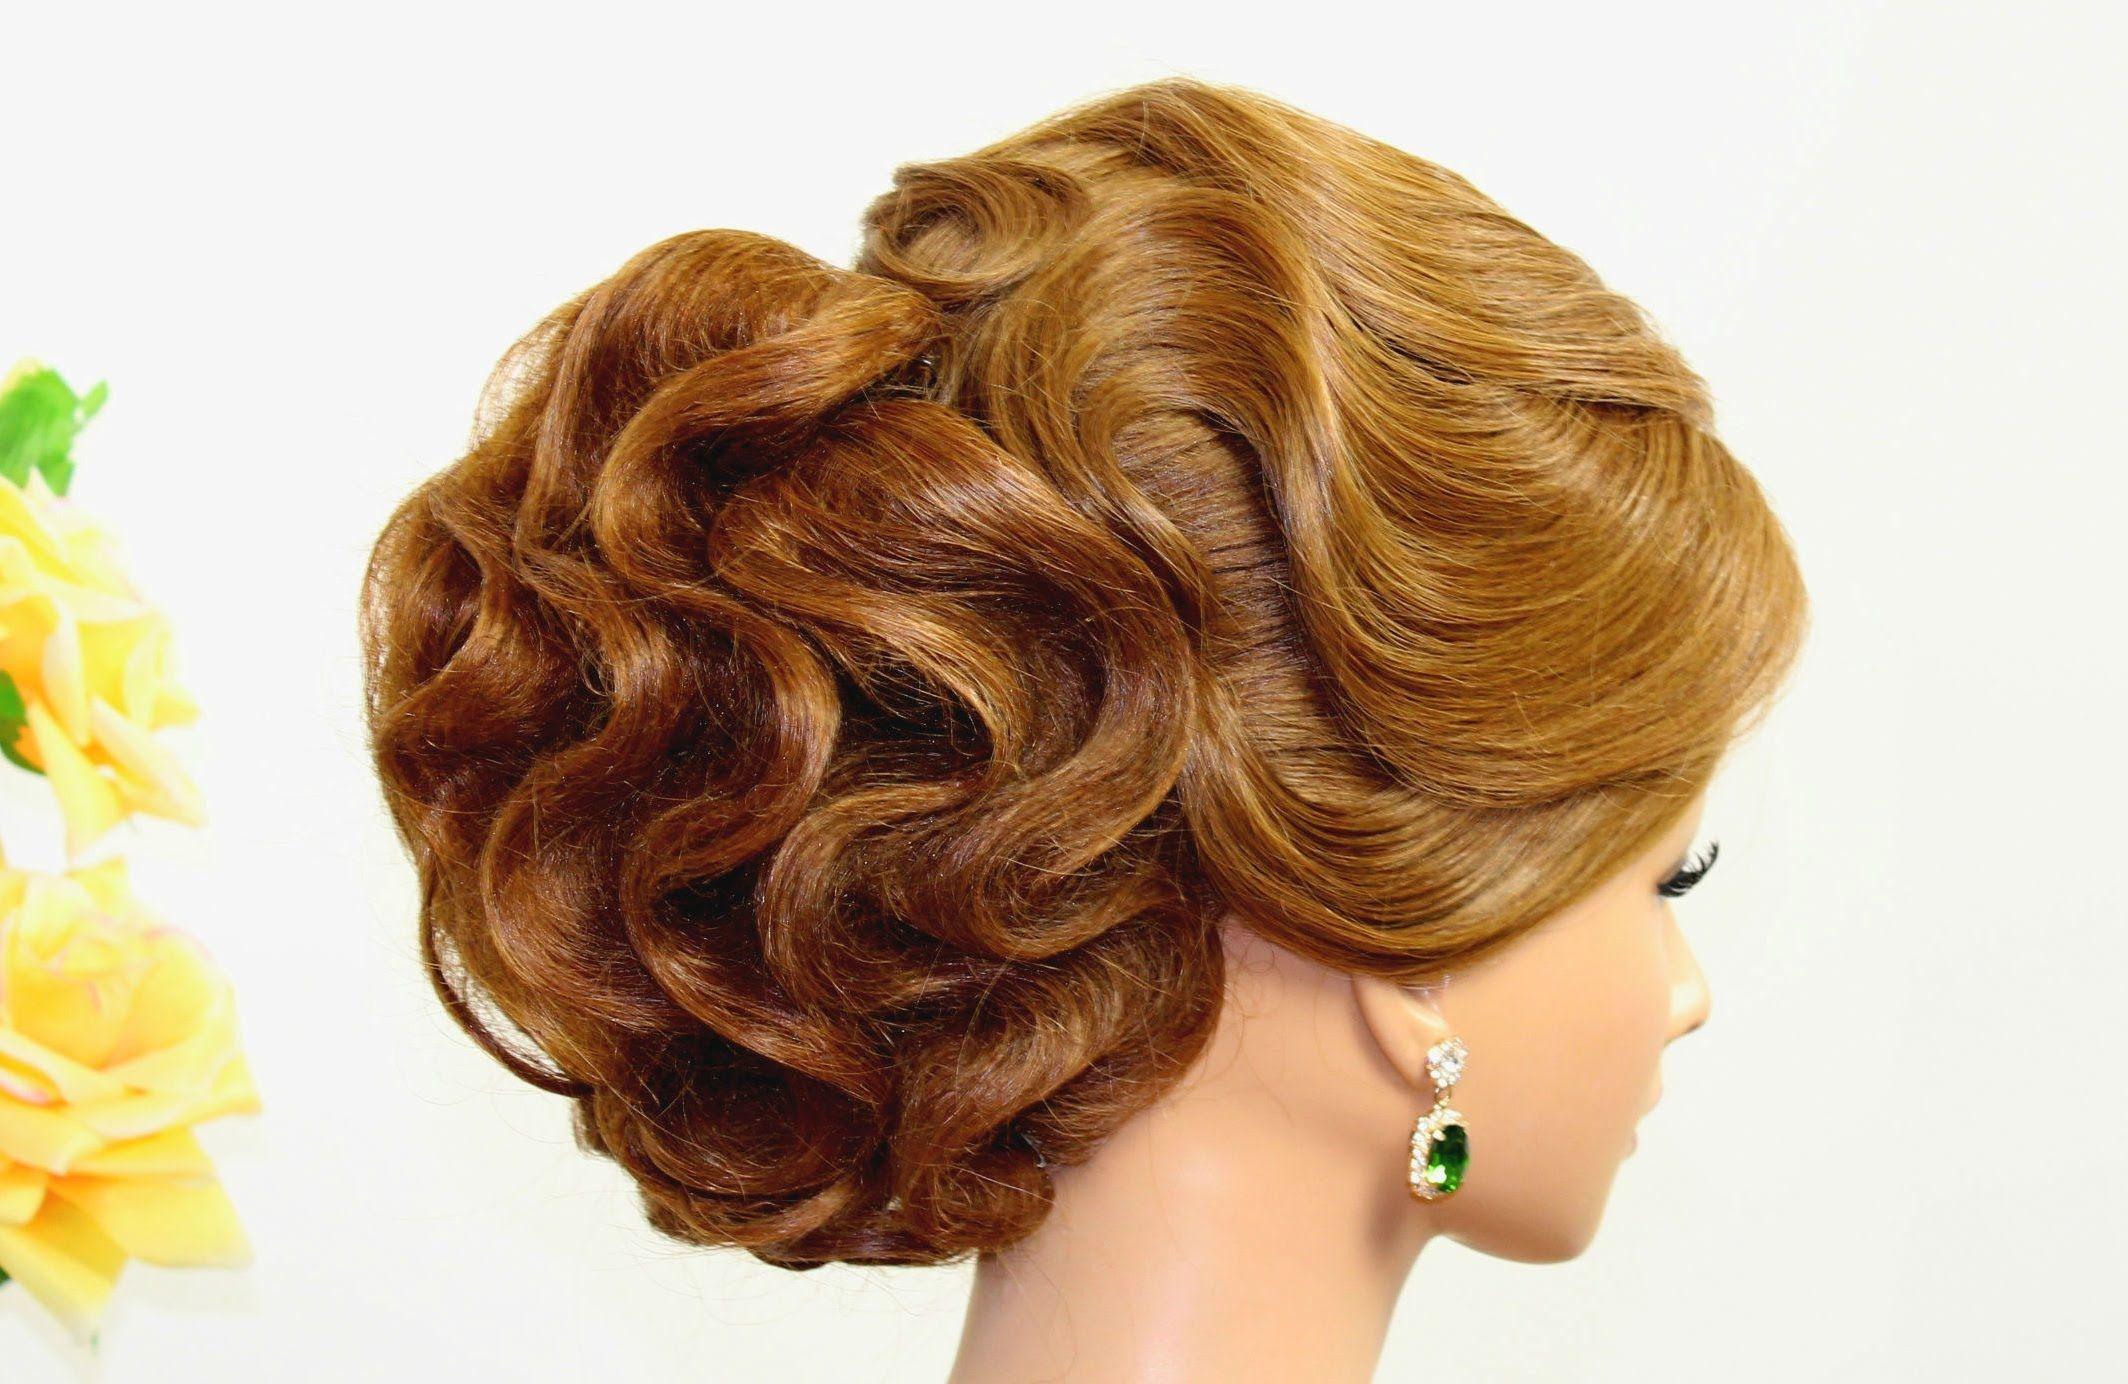 hairstyles for medium hair. updo hairstyles. bridal wedding